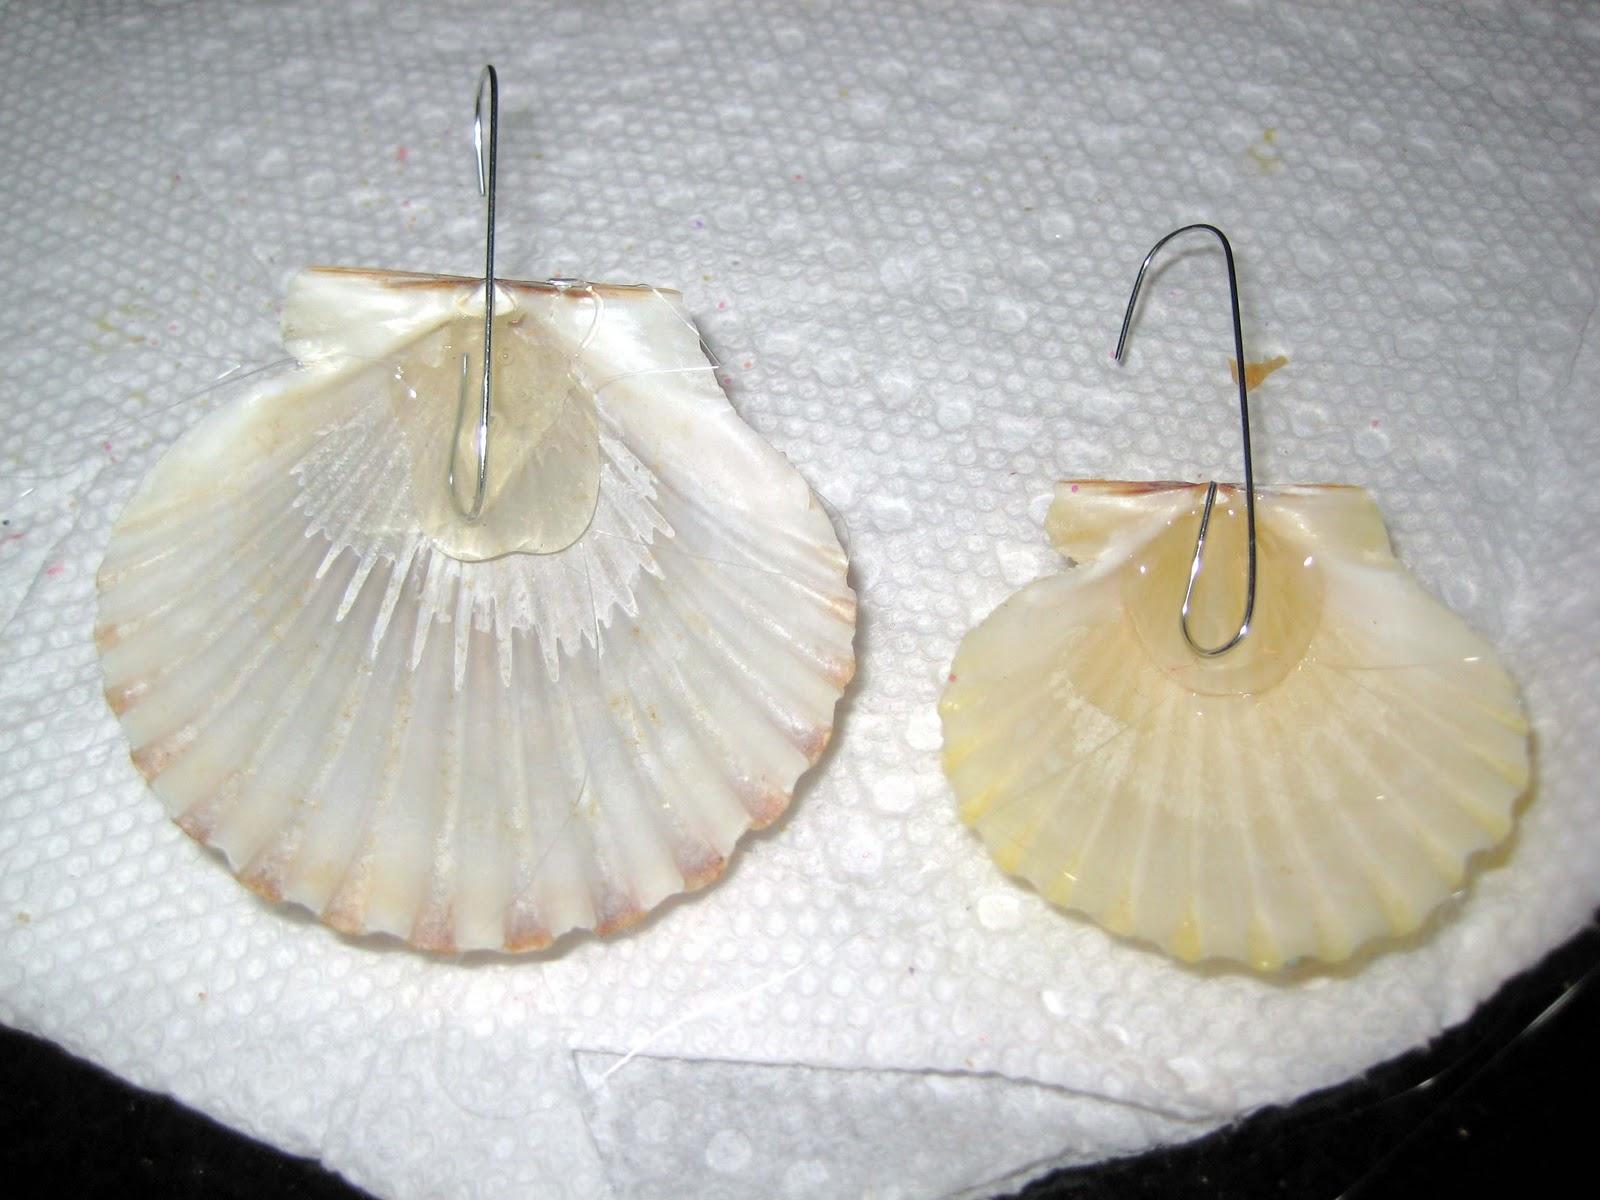 Sea shell christmas ornaments - Christmas Ornament Craft Glittered Sea Shells